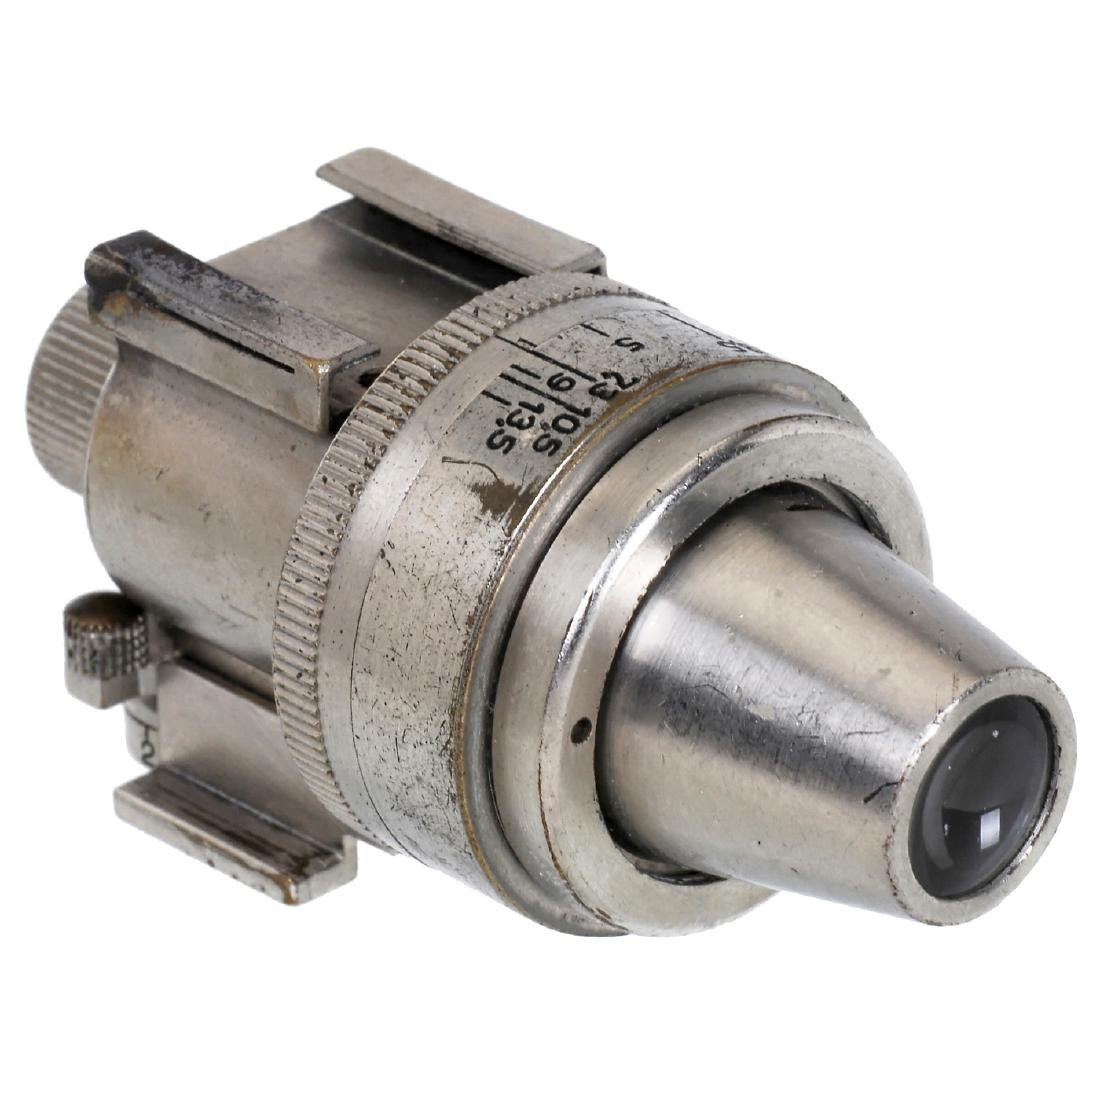 Rare Leitz Nickel VIDOM, 1932